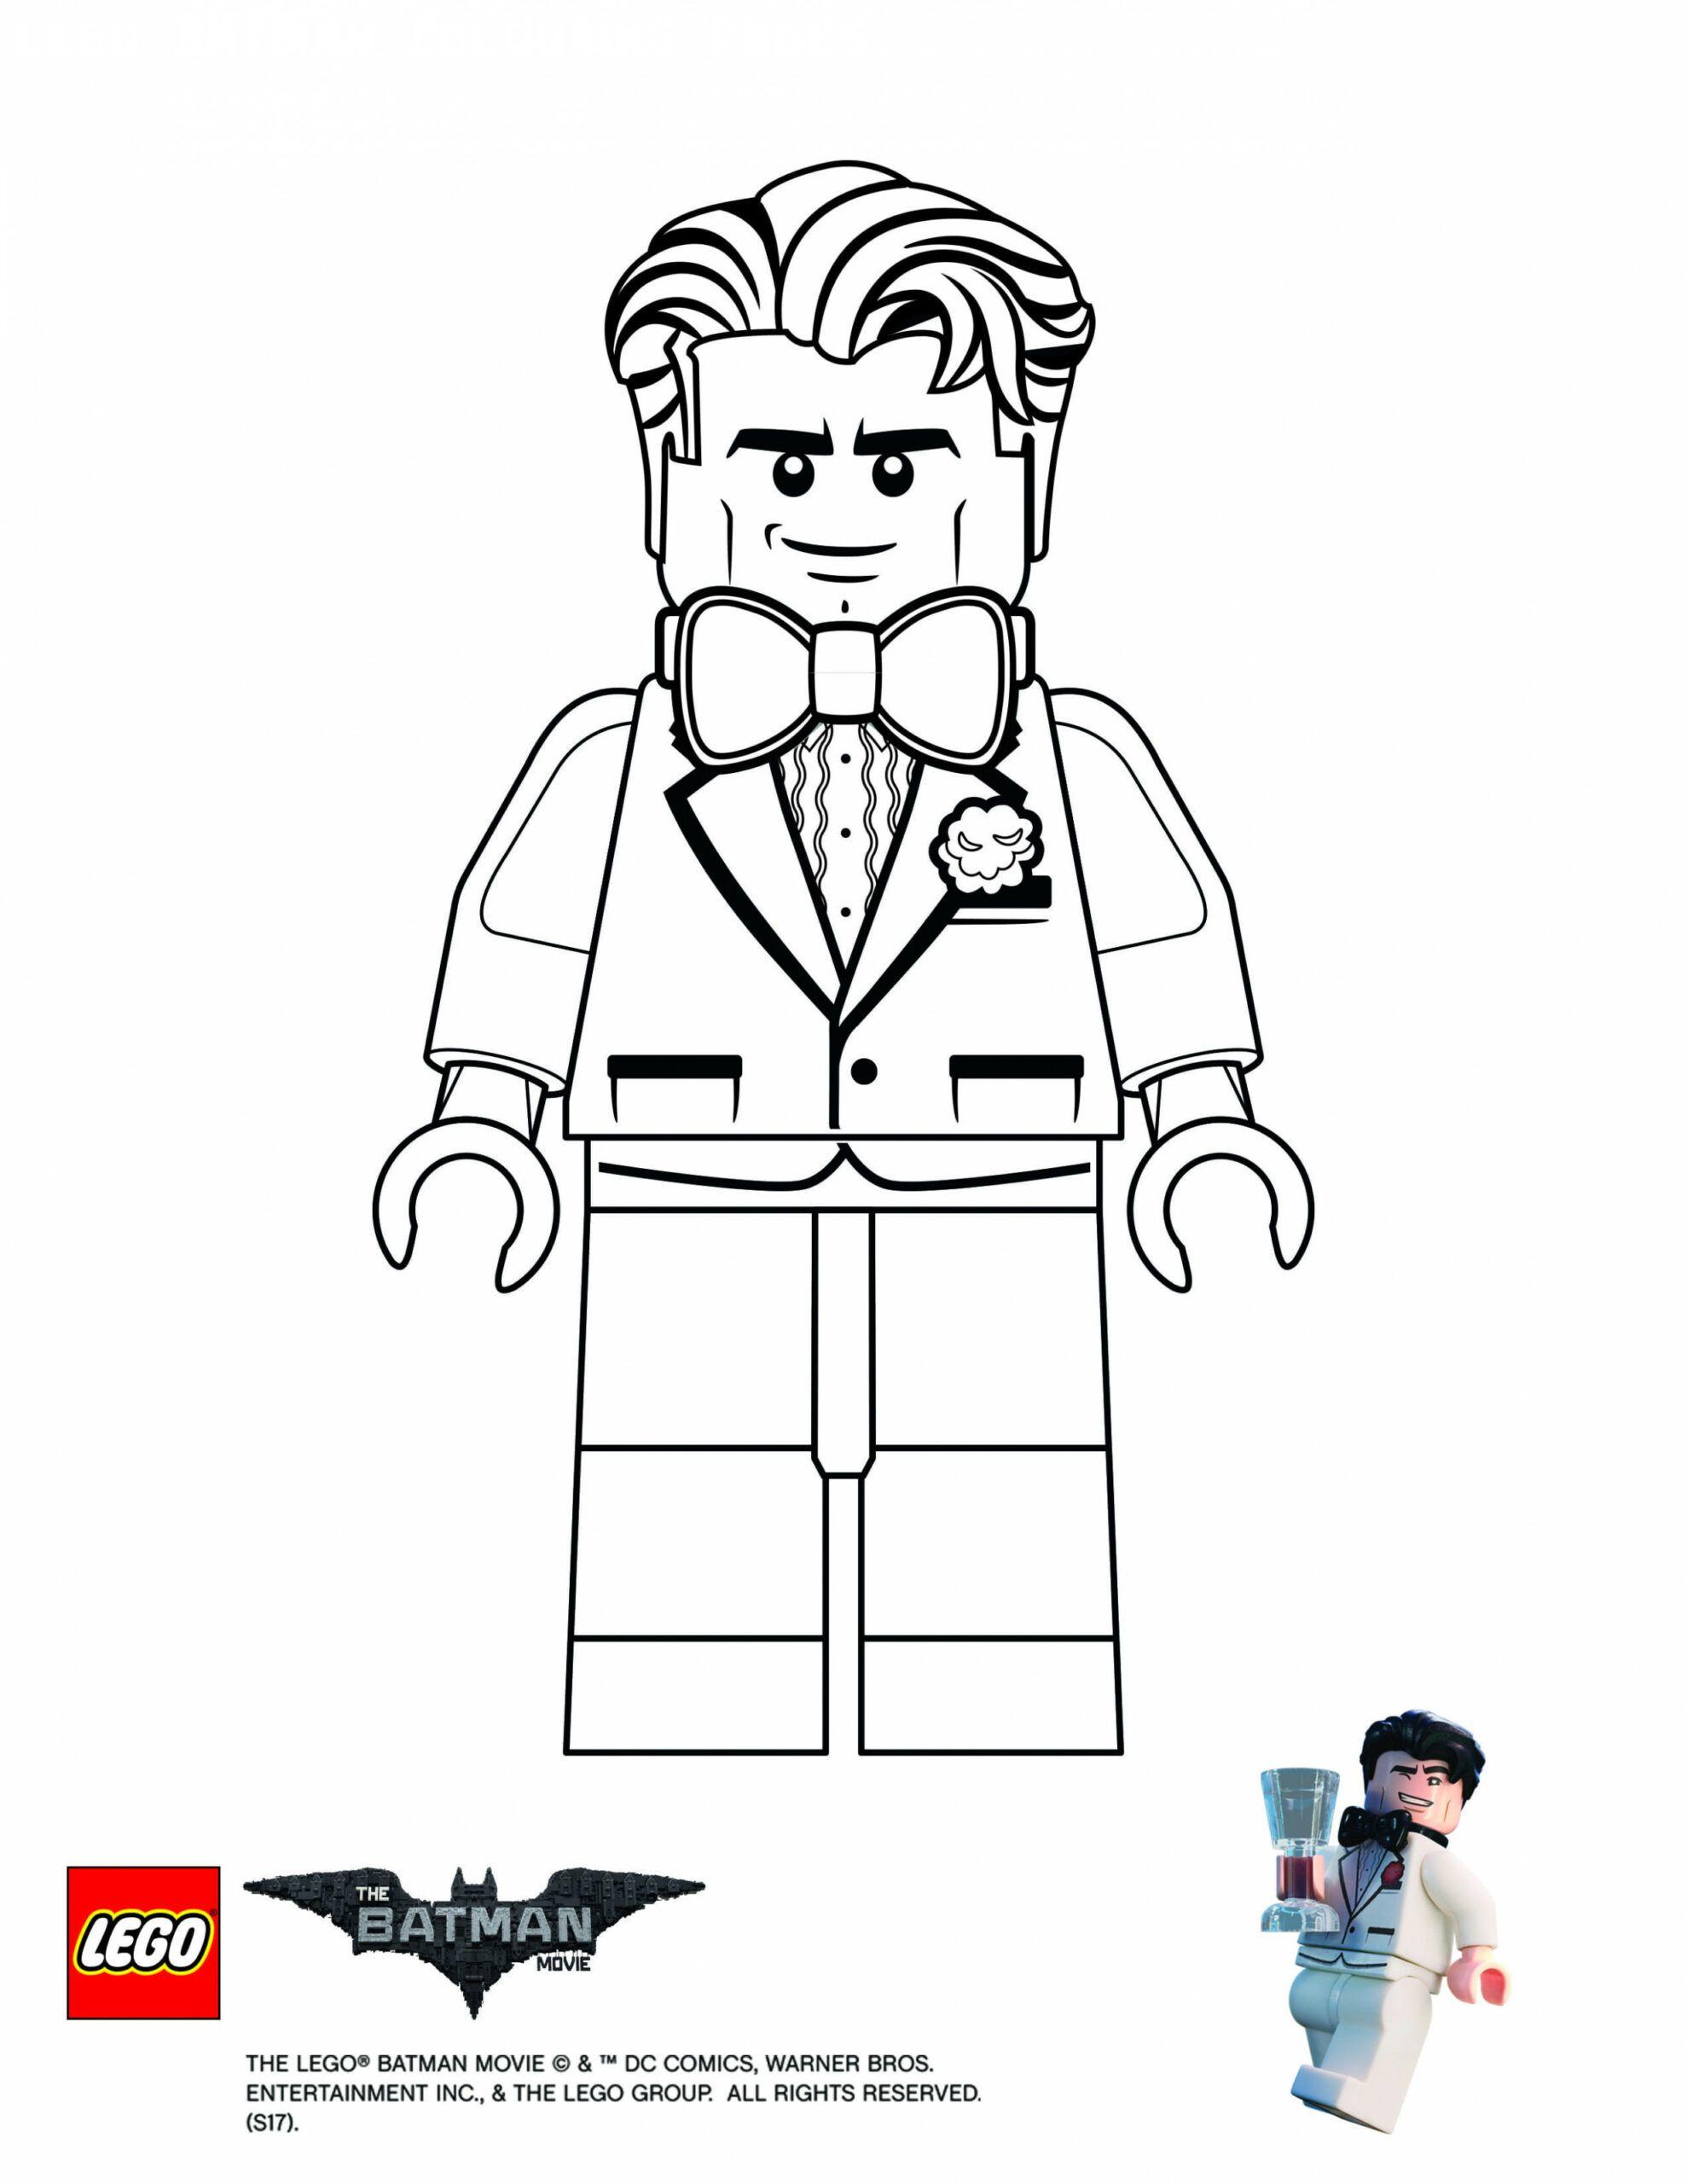 12 Lego Batman Colouring Pages in 2020 Batman coloring